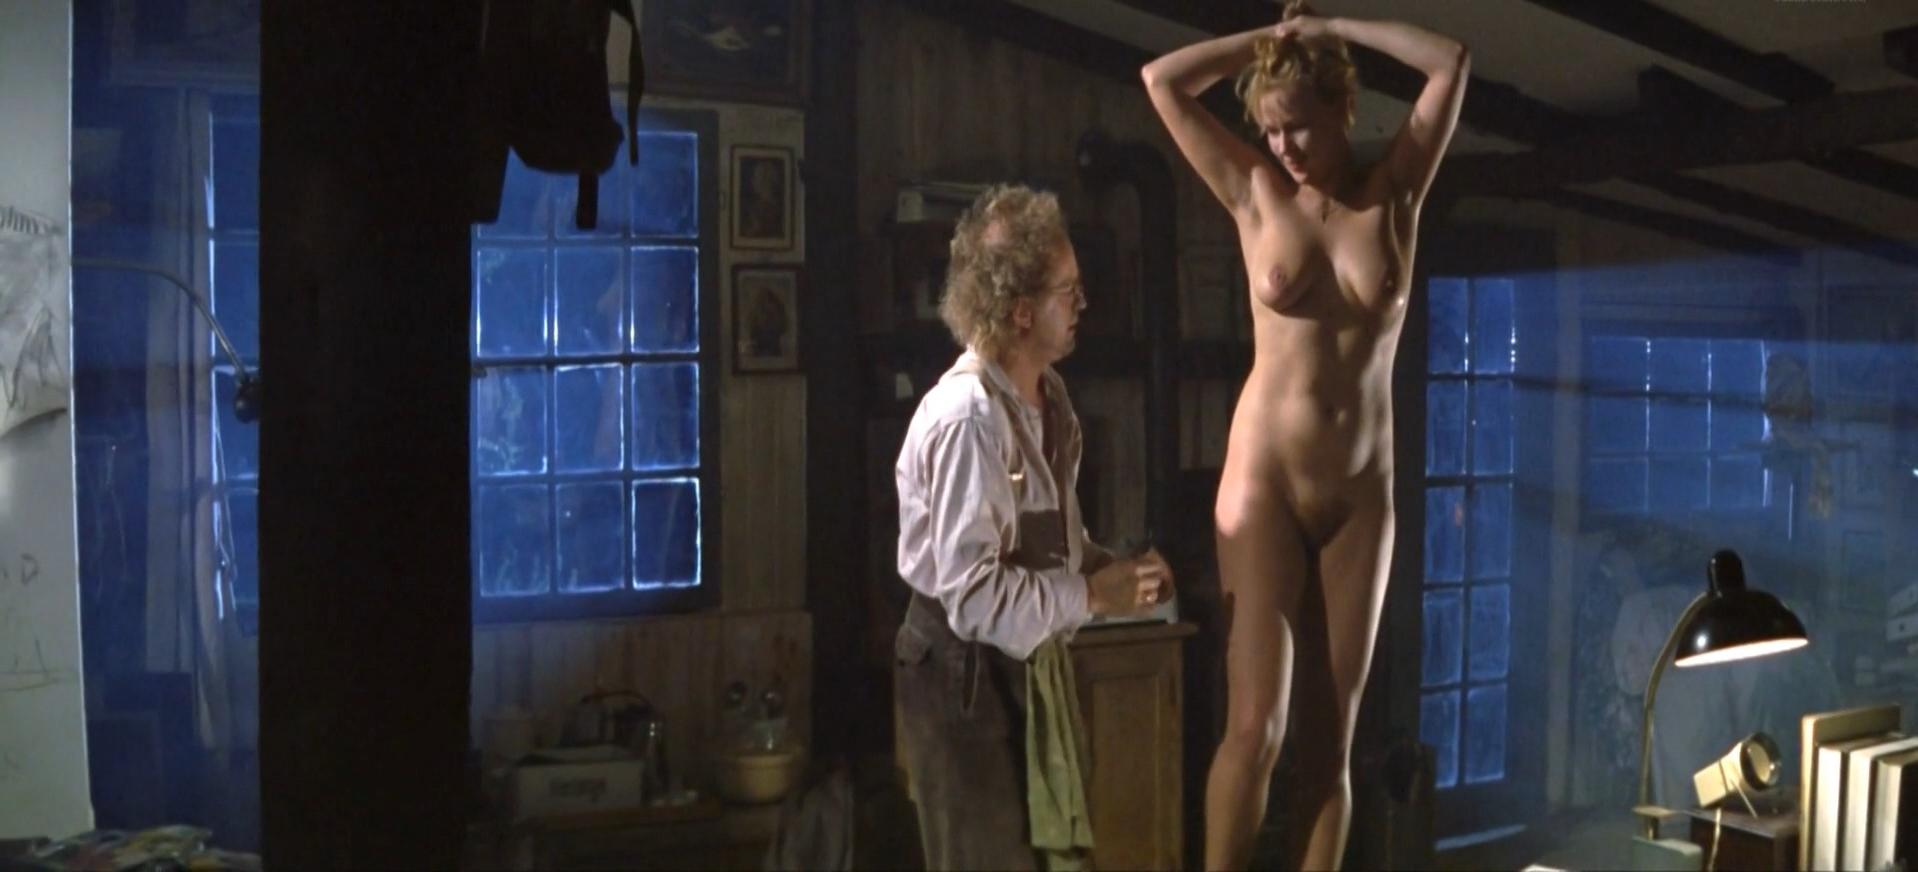 naked-women-in-cinema